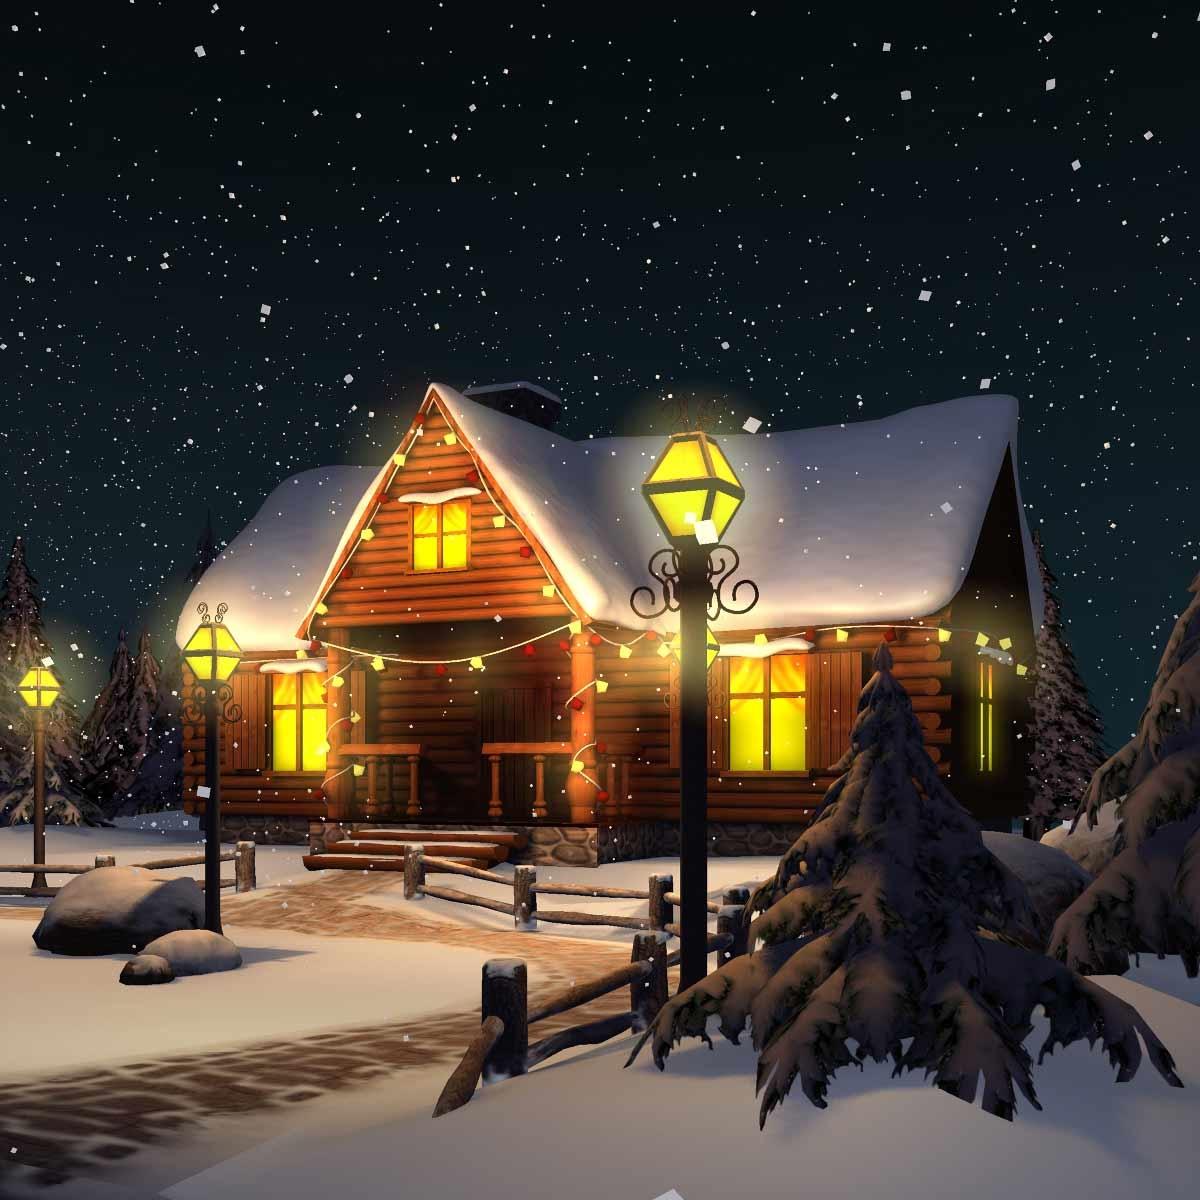 Christmas House.Winter Snow Christmas Scene